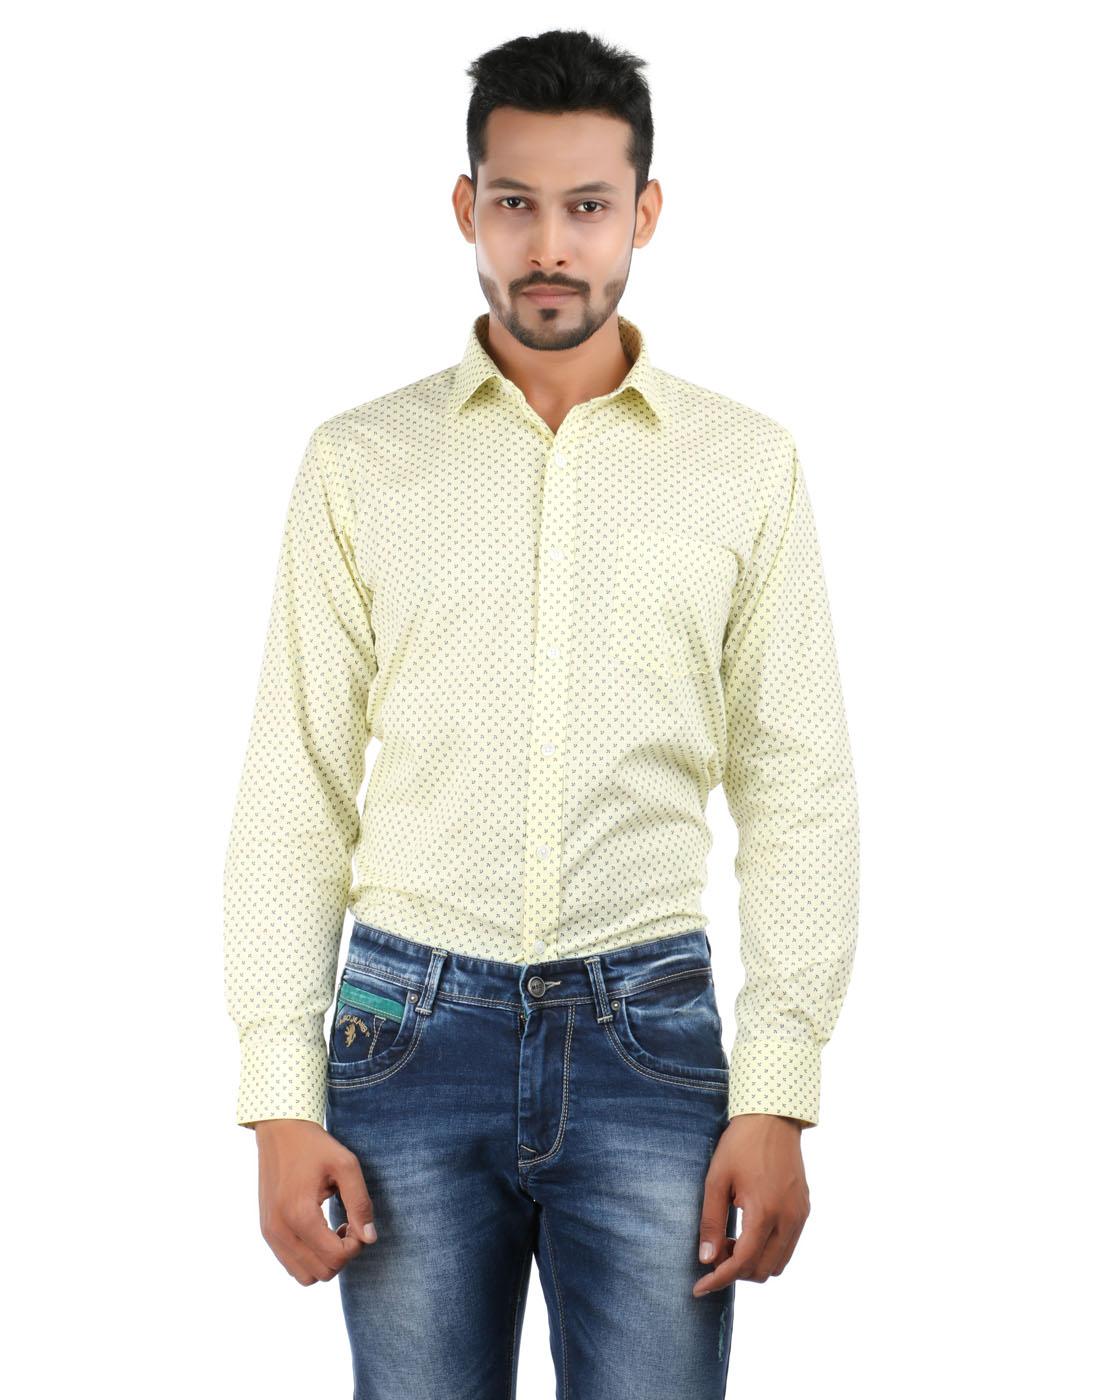 Oxemberg - Oxemberg Men's Printed Formal 100% Cotton Yellow Shirt